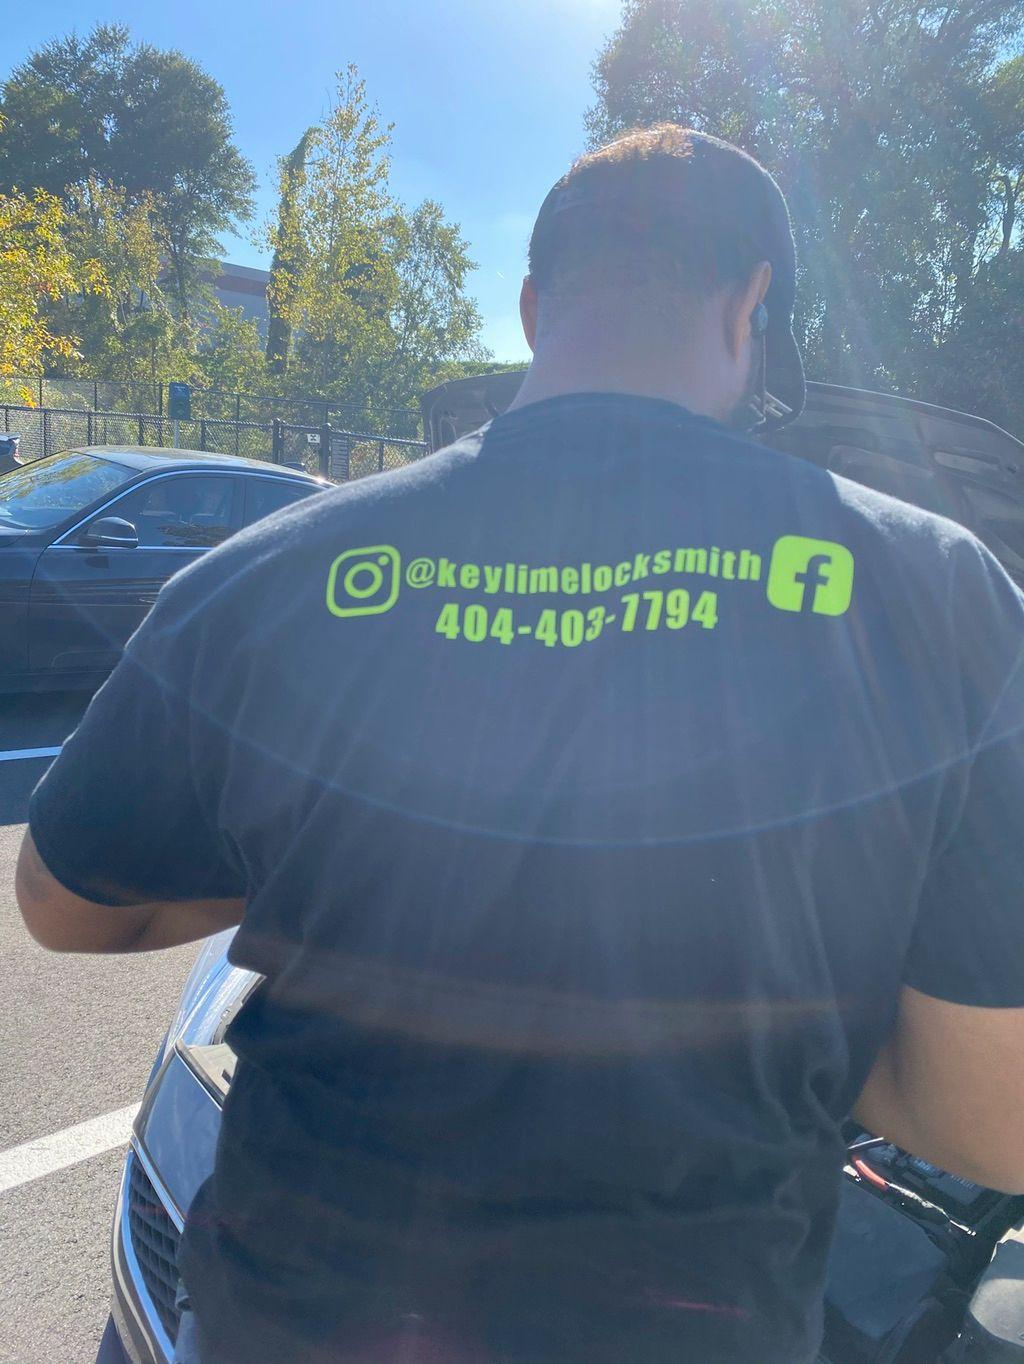 Keylime Locksmith & Roadside Assistance